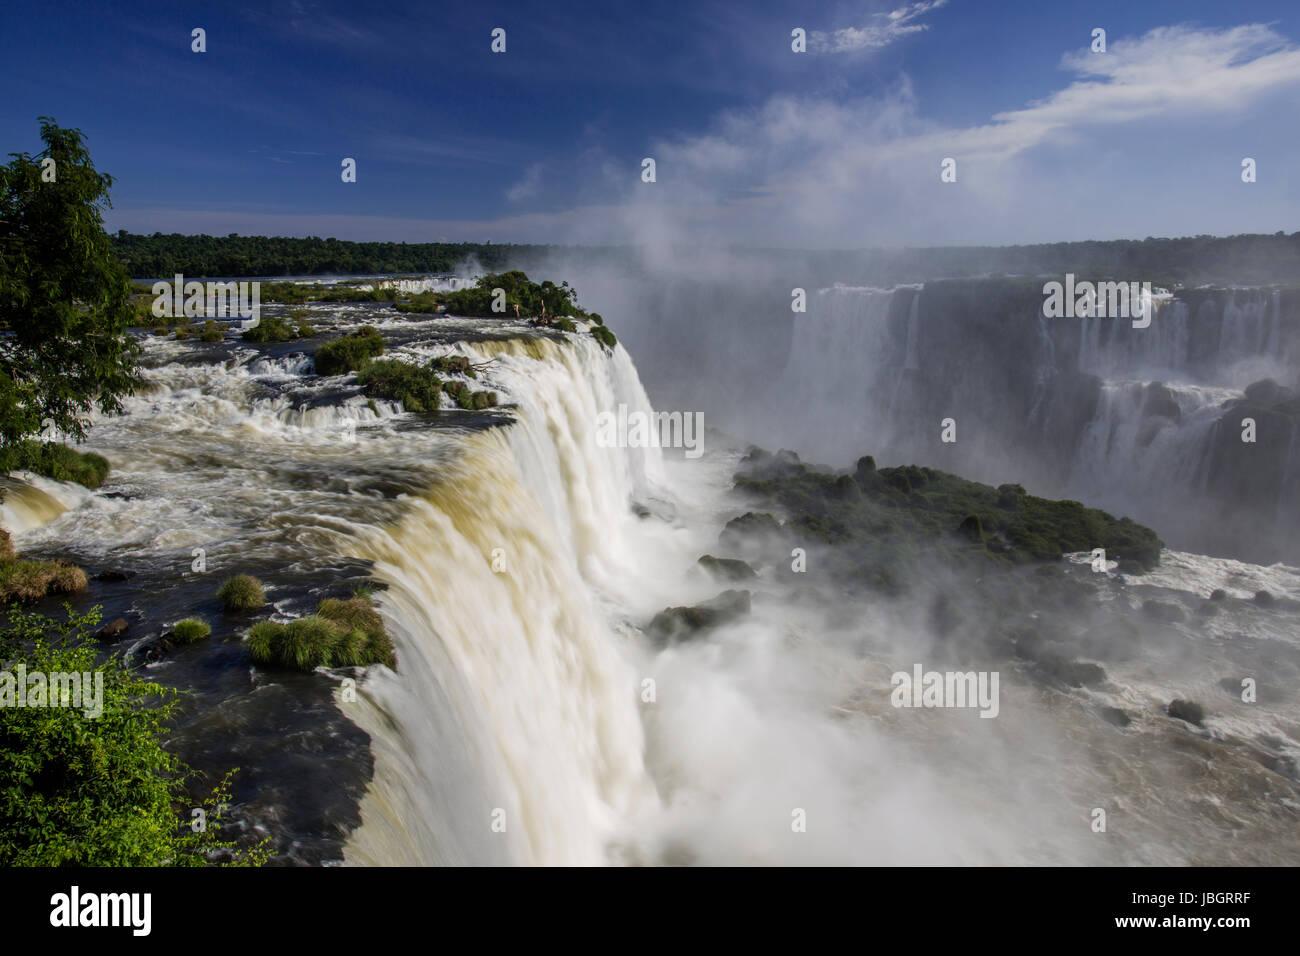 Iguassu Falls Argentina and Brazil Stock Photo